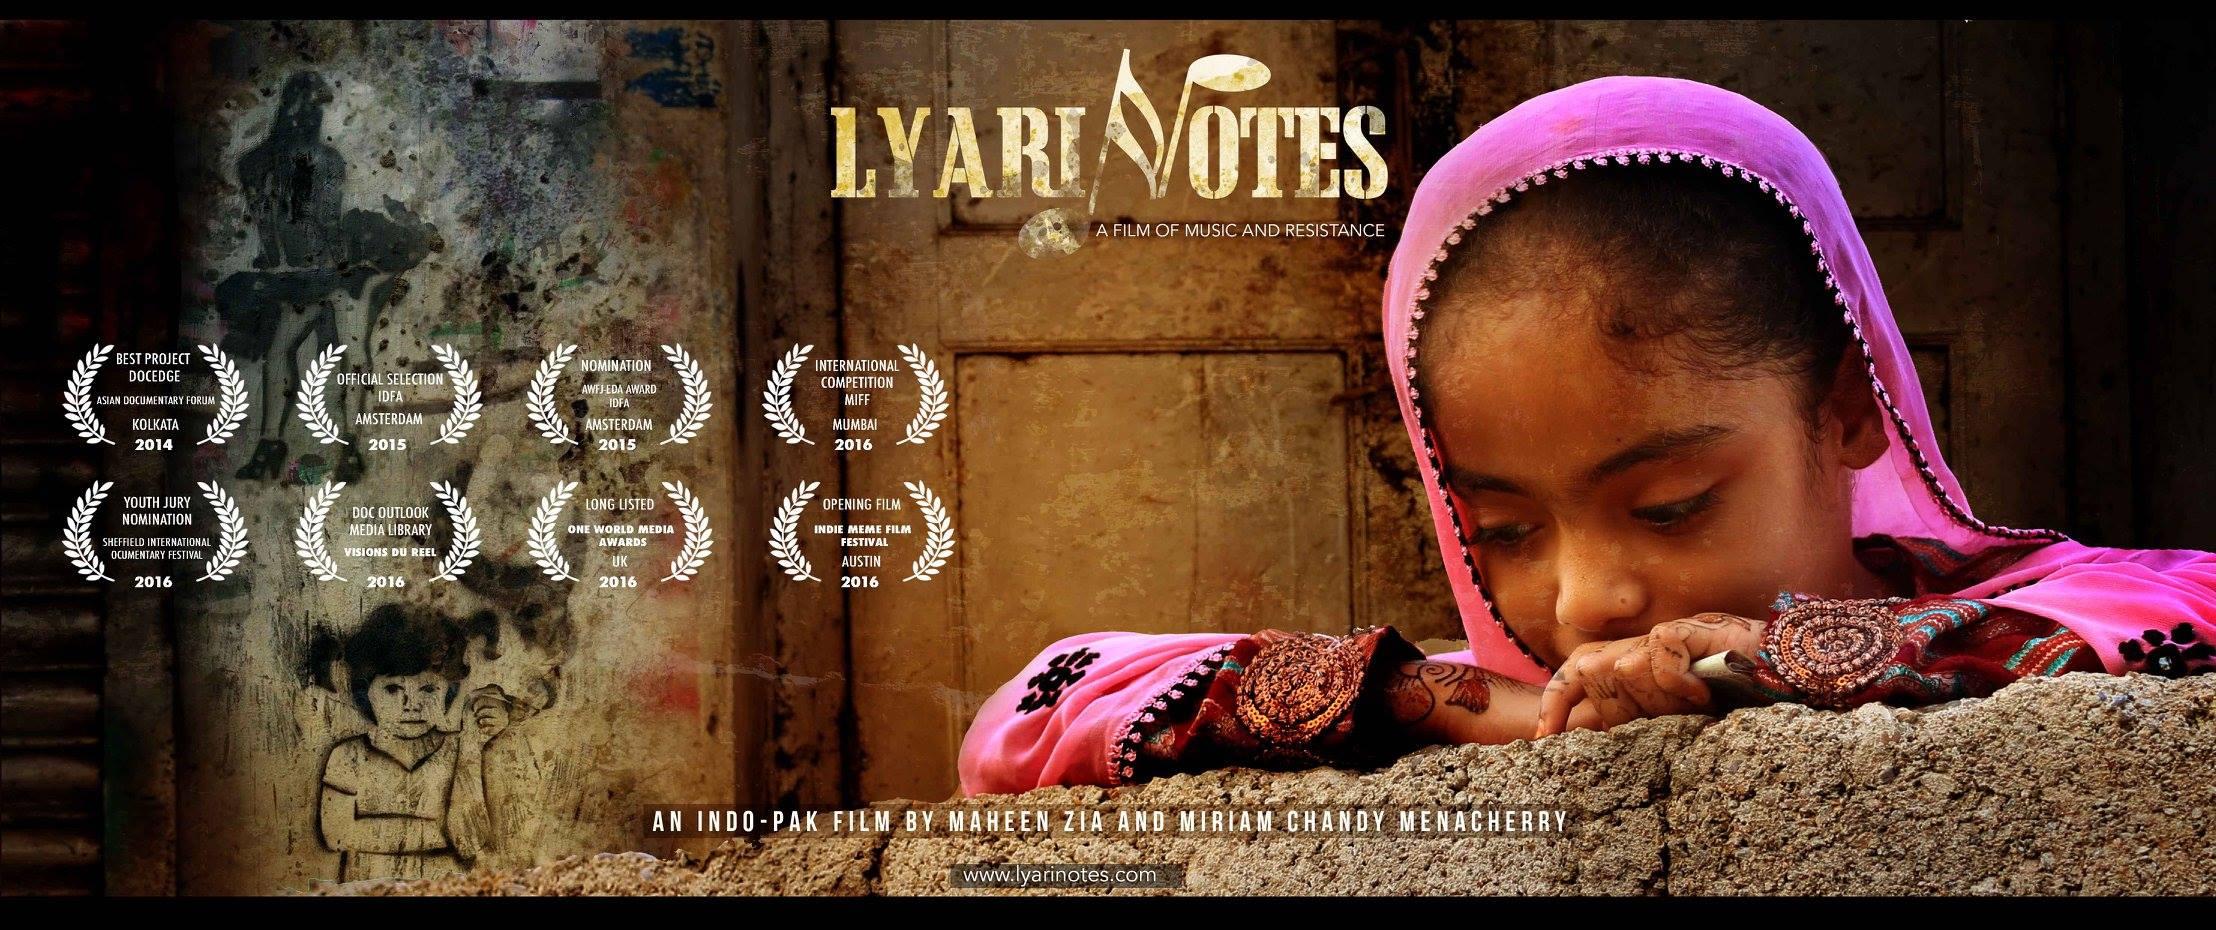 From Lyari to Mumbai: A creative cross-border collaboration